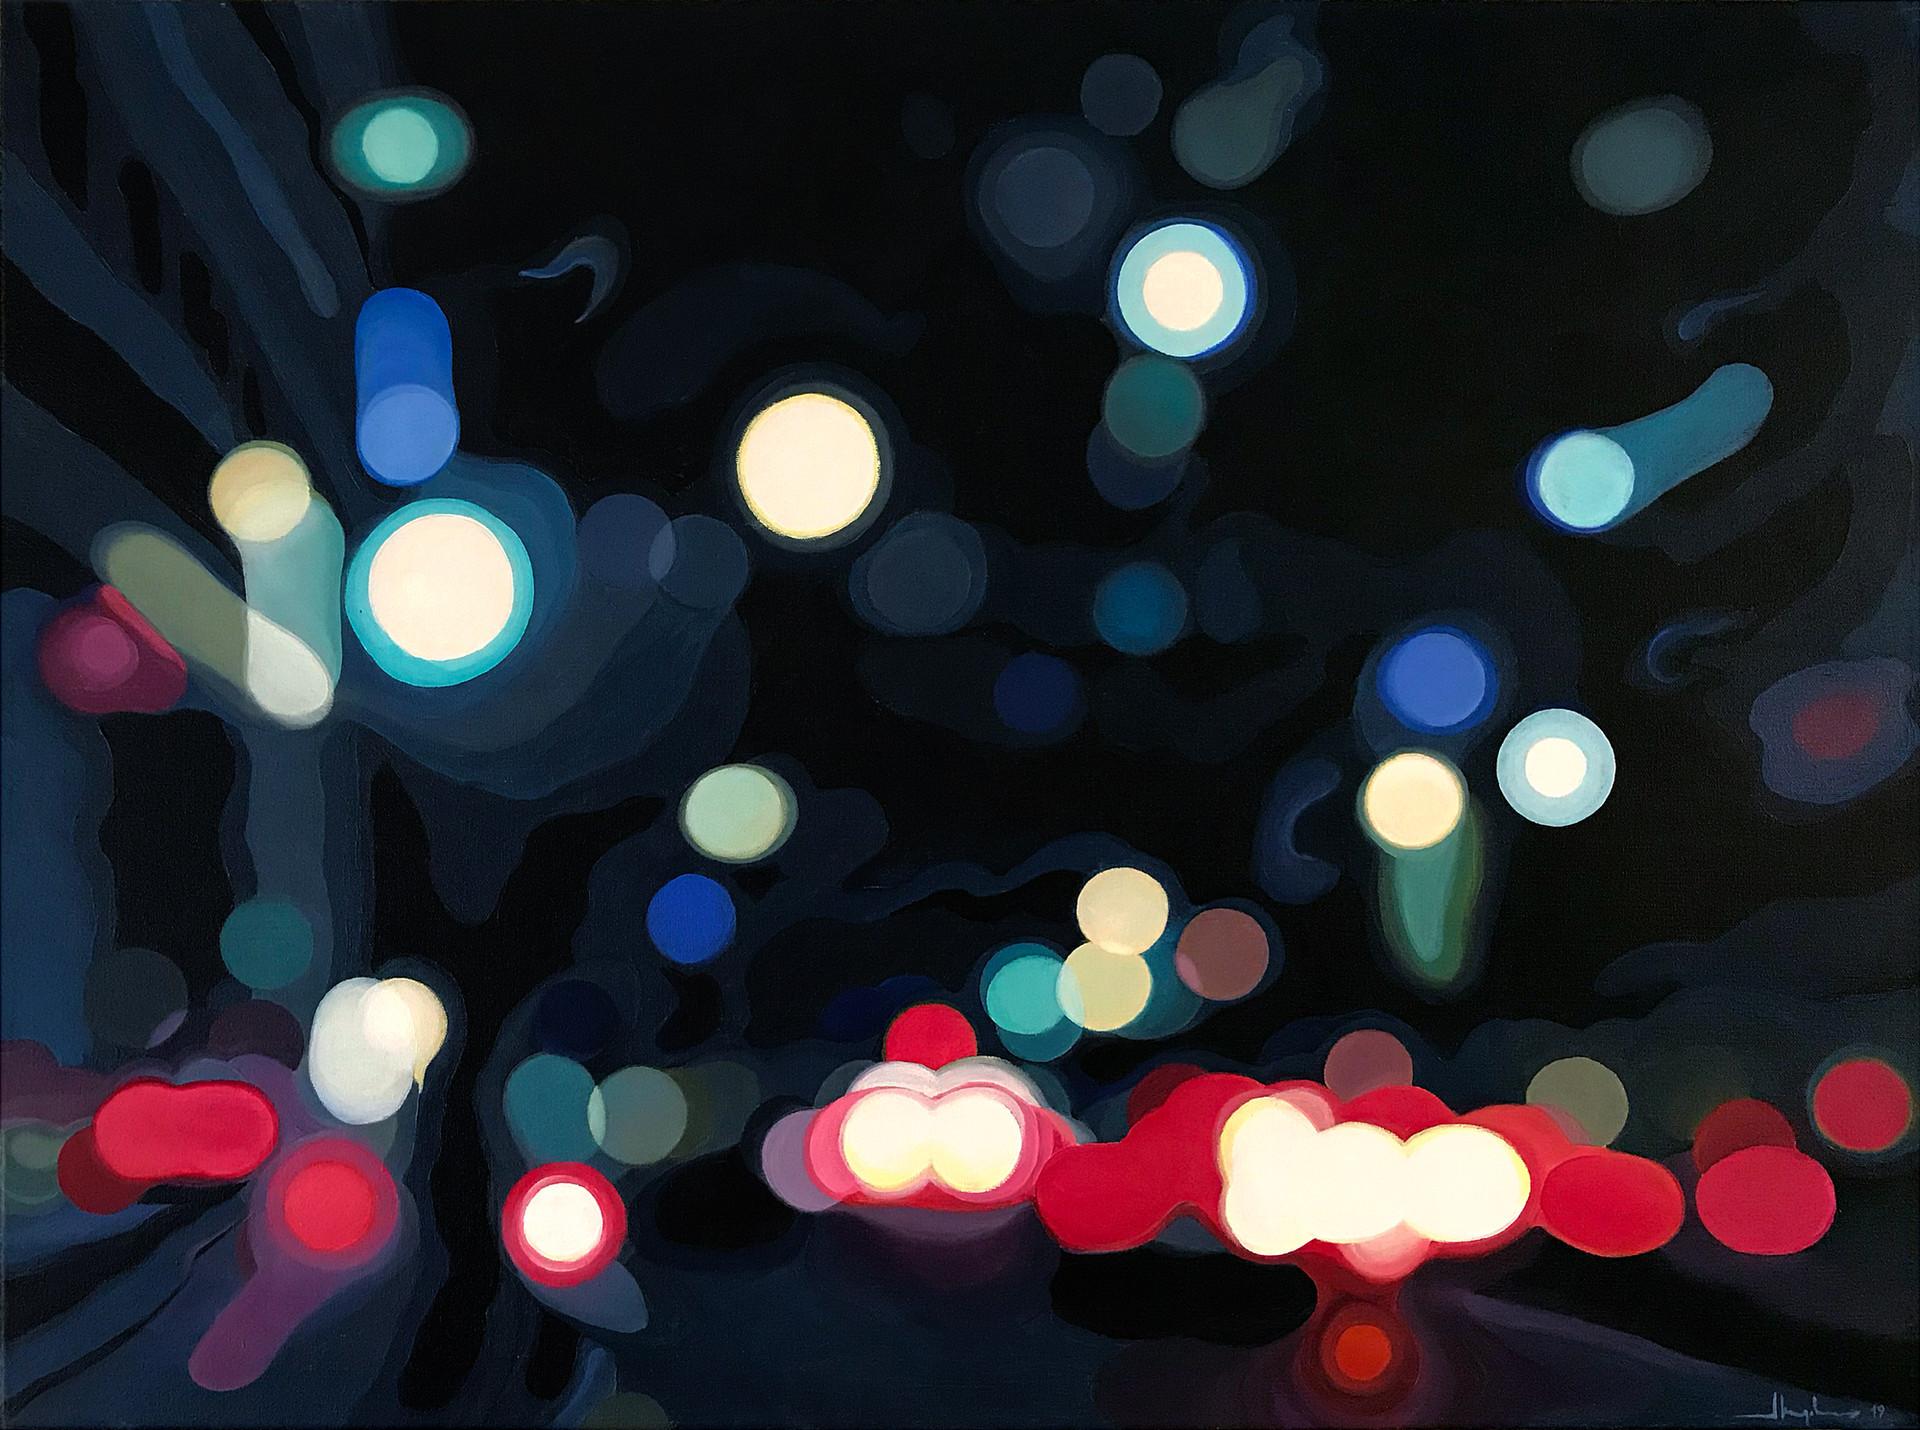 NOCTURNE #20 / Mission Street